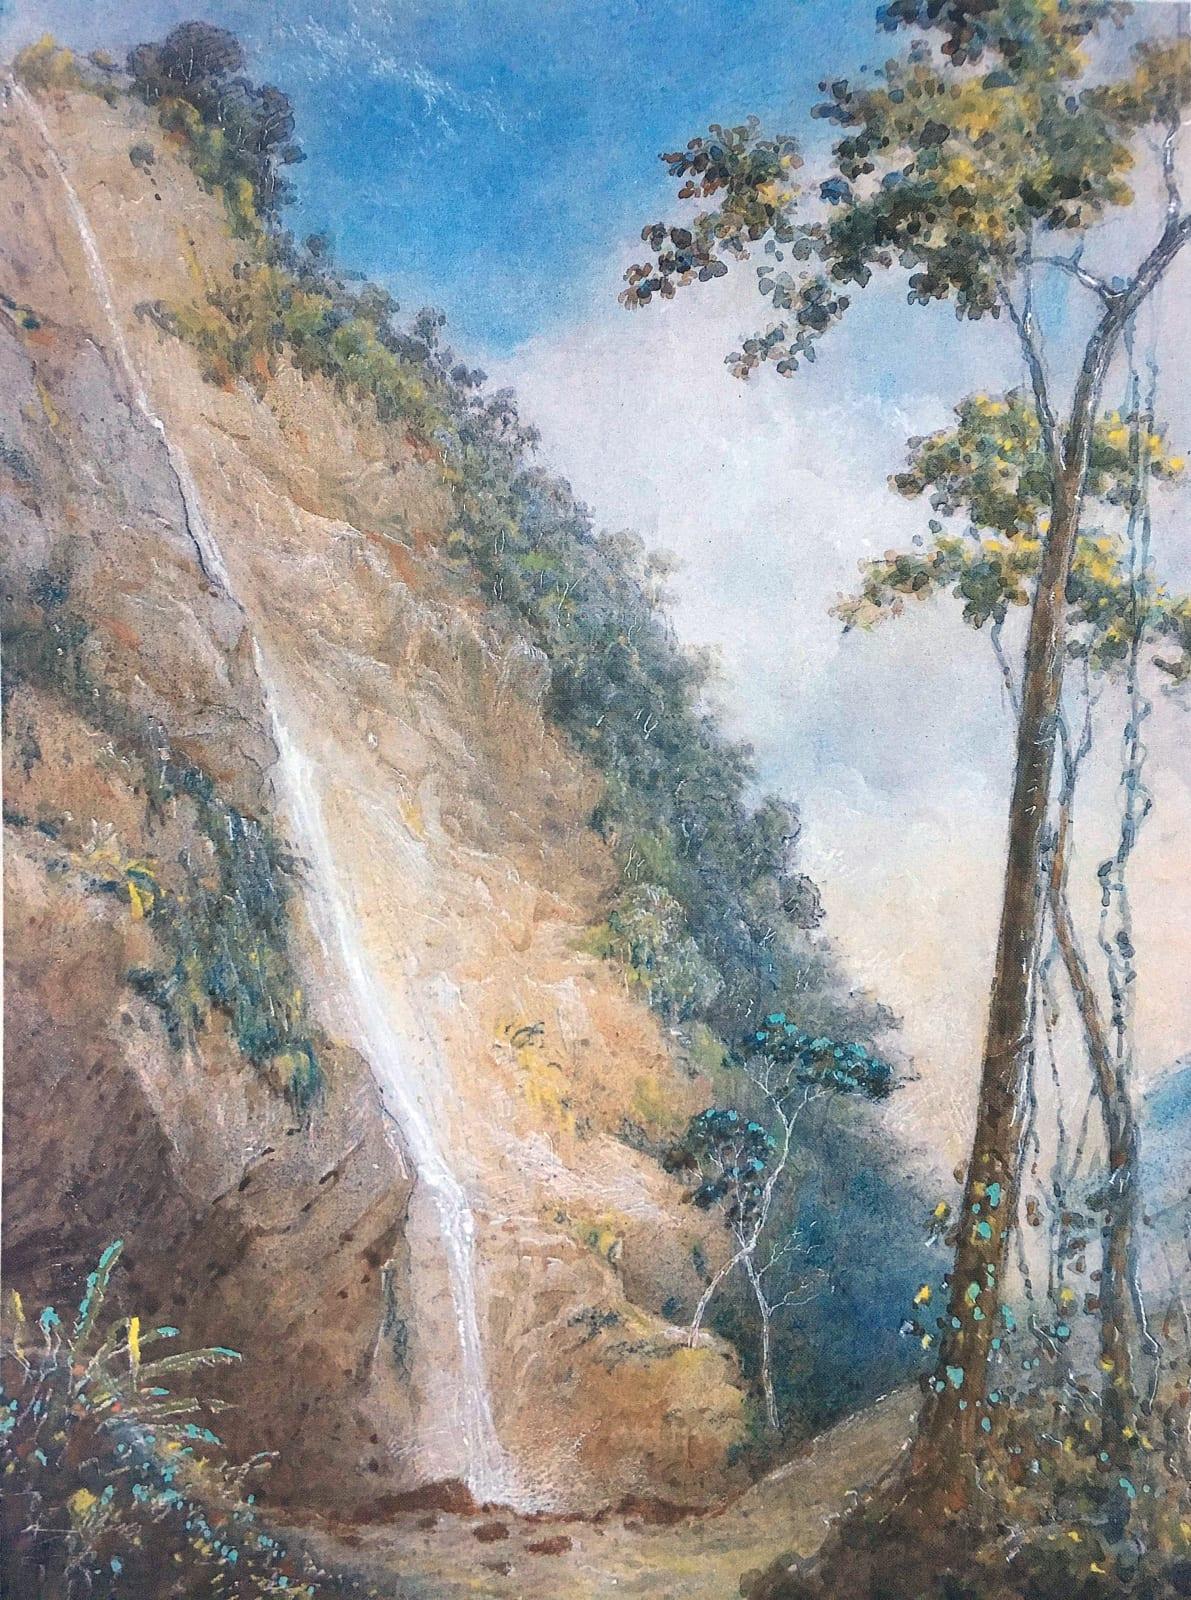 Michel-Jean Cazabon Maraccas Waterfall I 1849 Watercolor 10 1/2 x 14 1/2 inches Collection of William Burnley; Fane-Gladwin